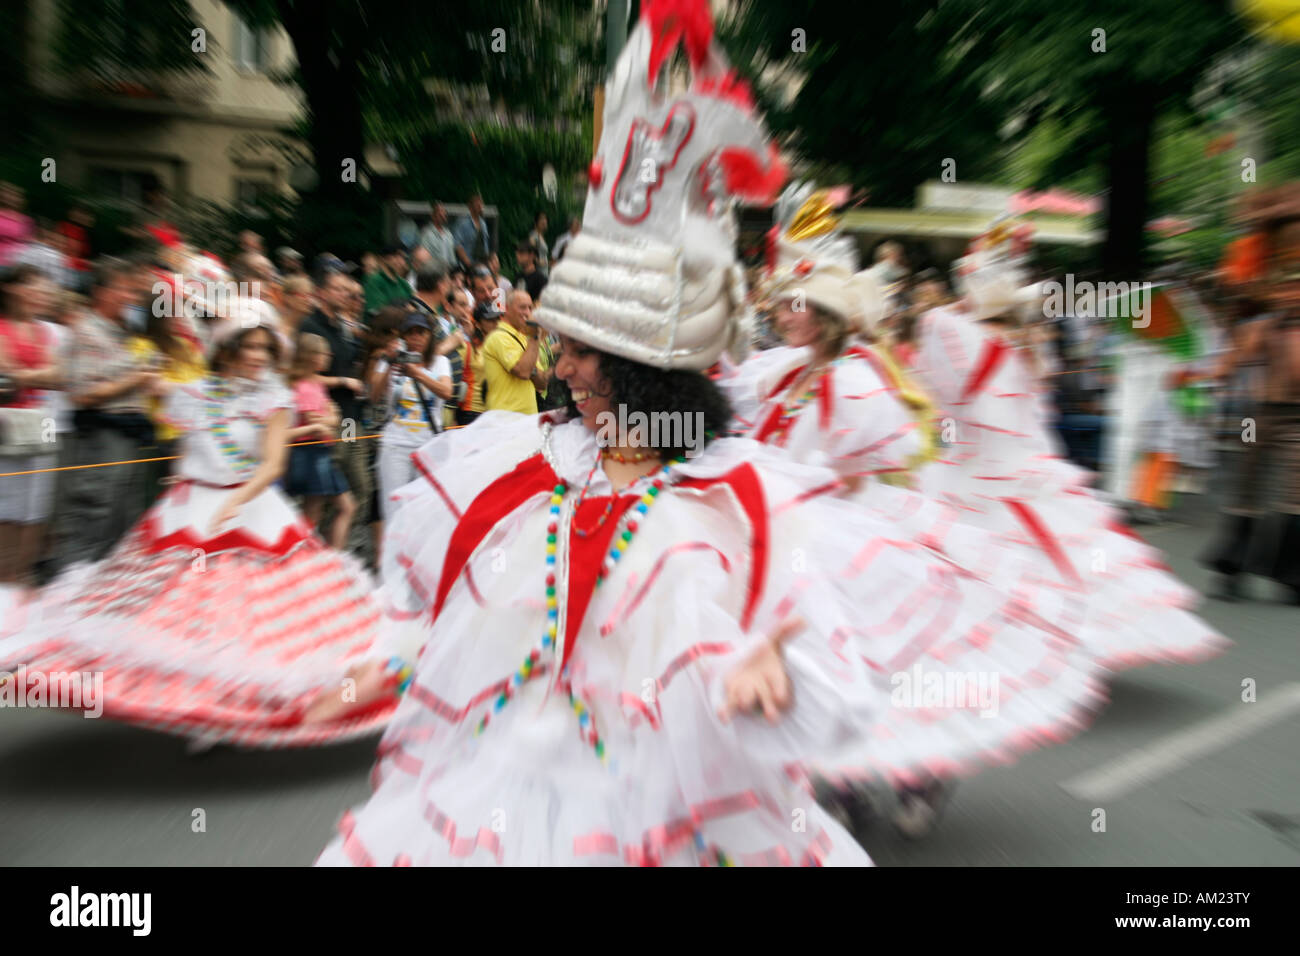 Carneval of Cultures, Kreuzberg, Berlin, Germany - Stock Image